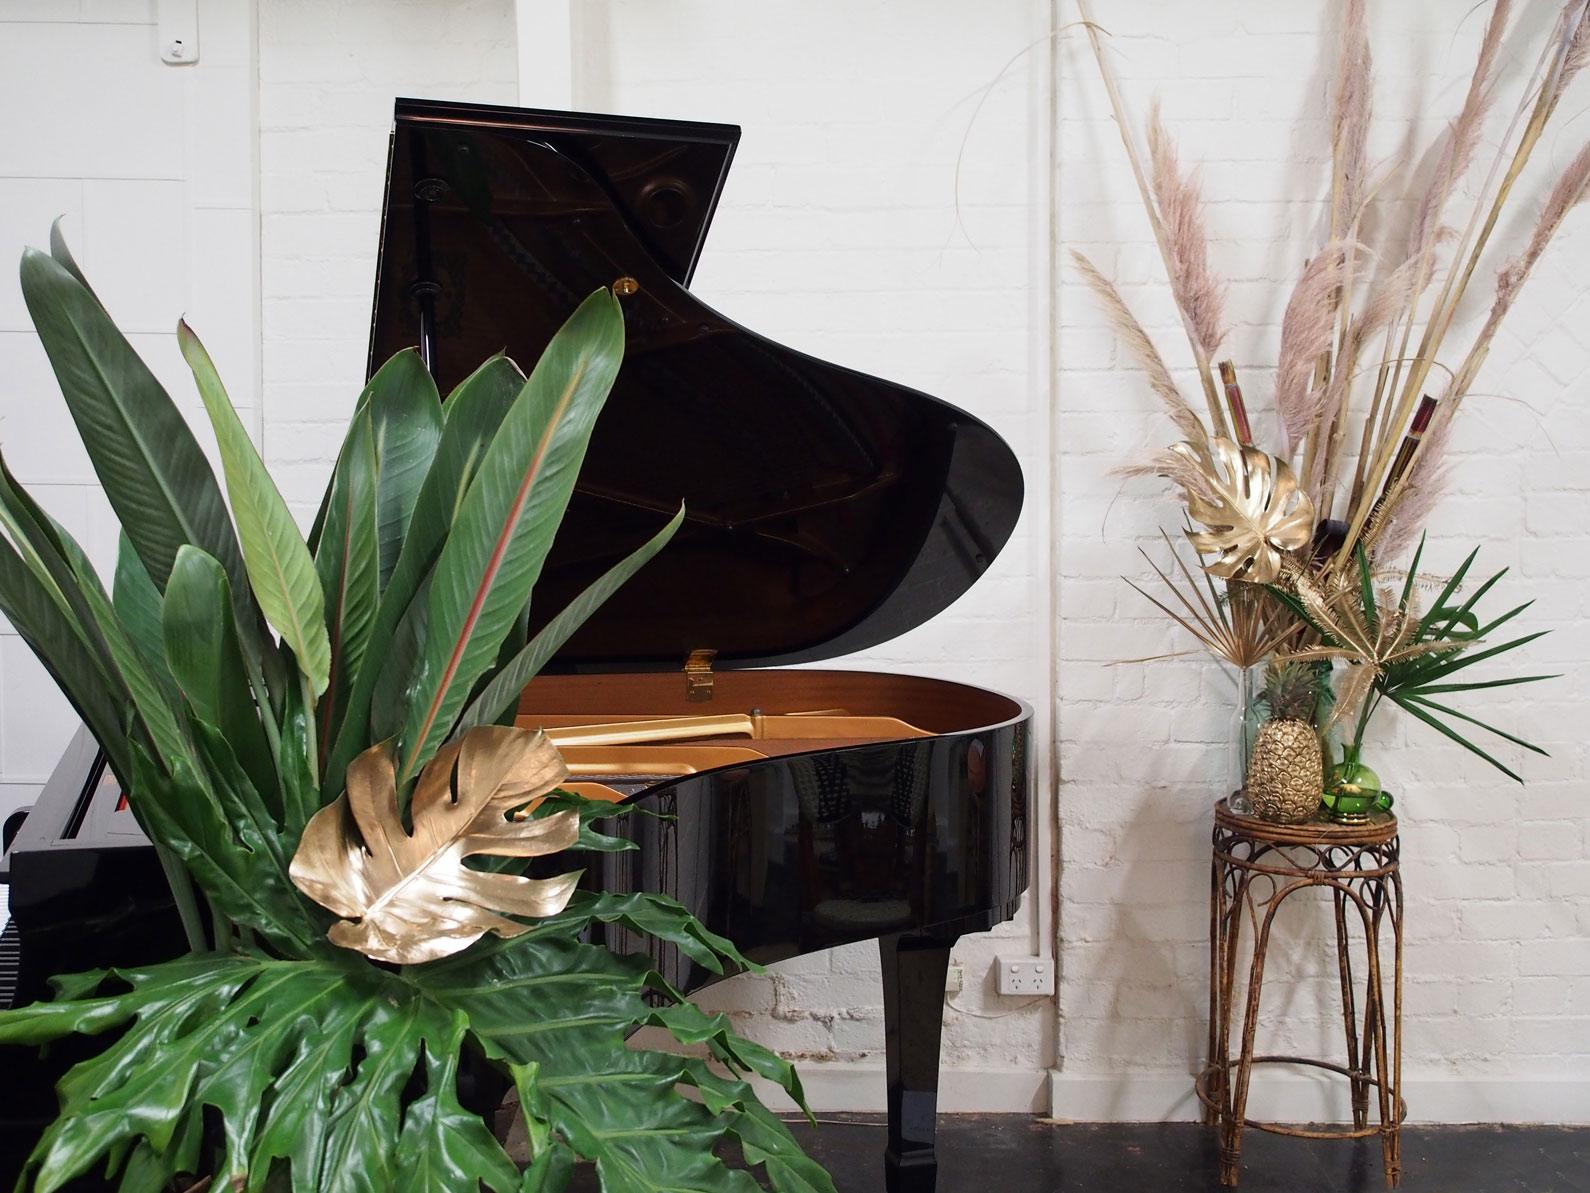 Studio-Mimi-Moon-New-Palm-Court-Orchestra-Styling-art-direction-Photoshoot-